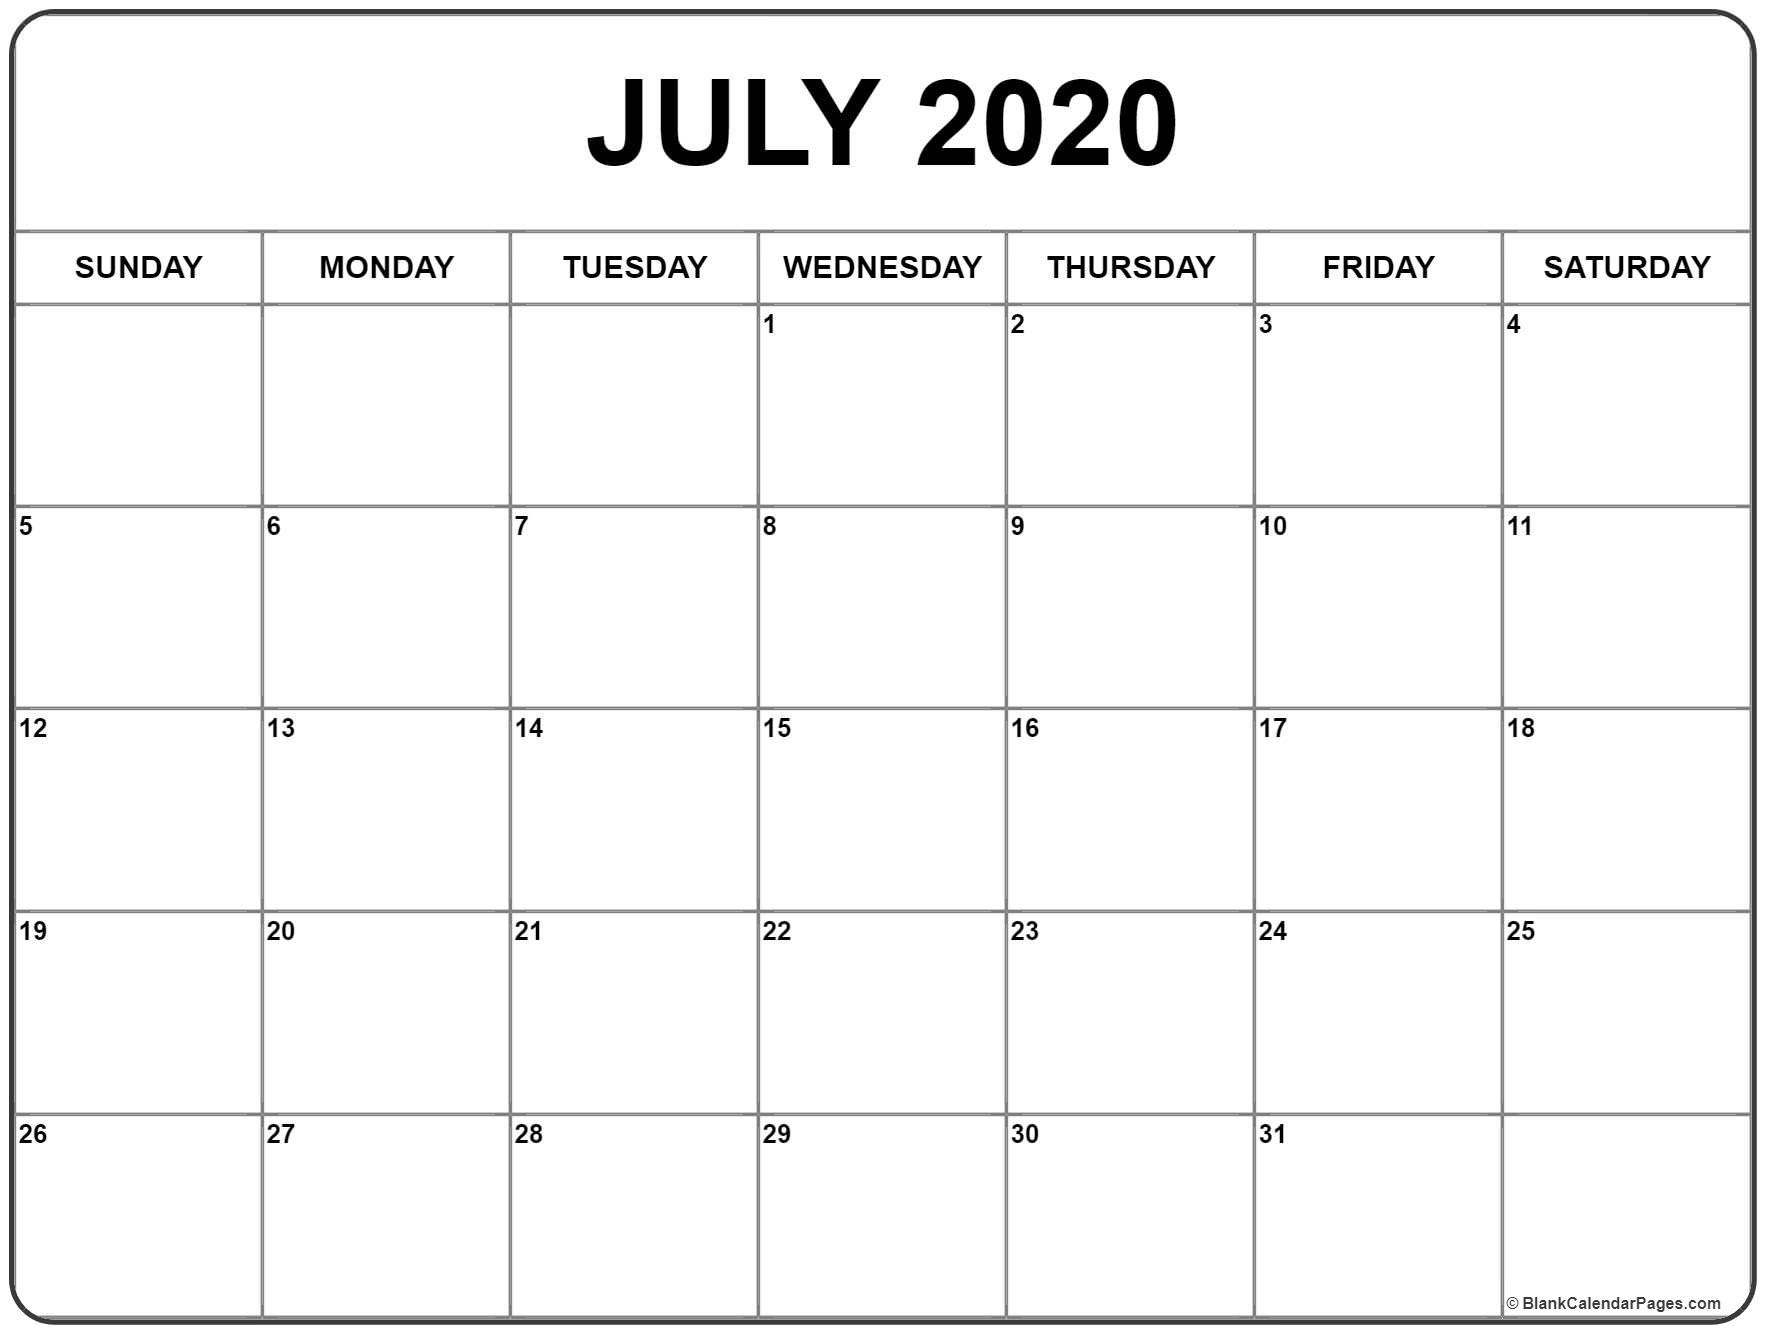 July 2020 Calendar | Free Printable Monthly Calendars regarding 2020 Free Printable Calendar Large Numbers